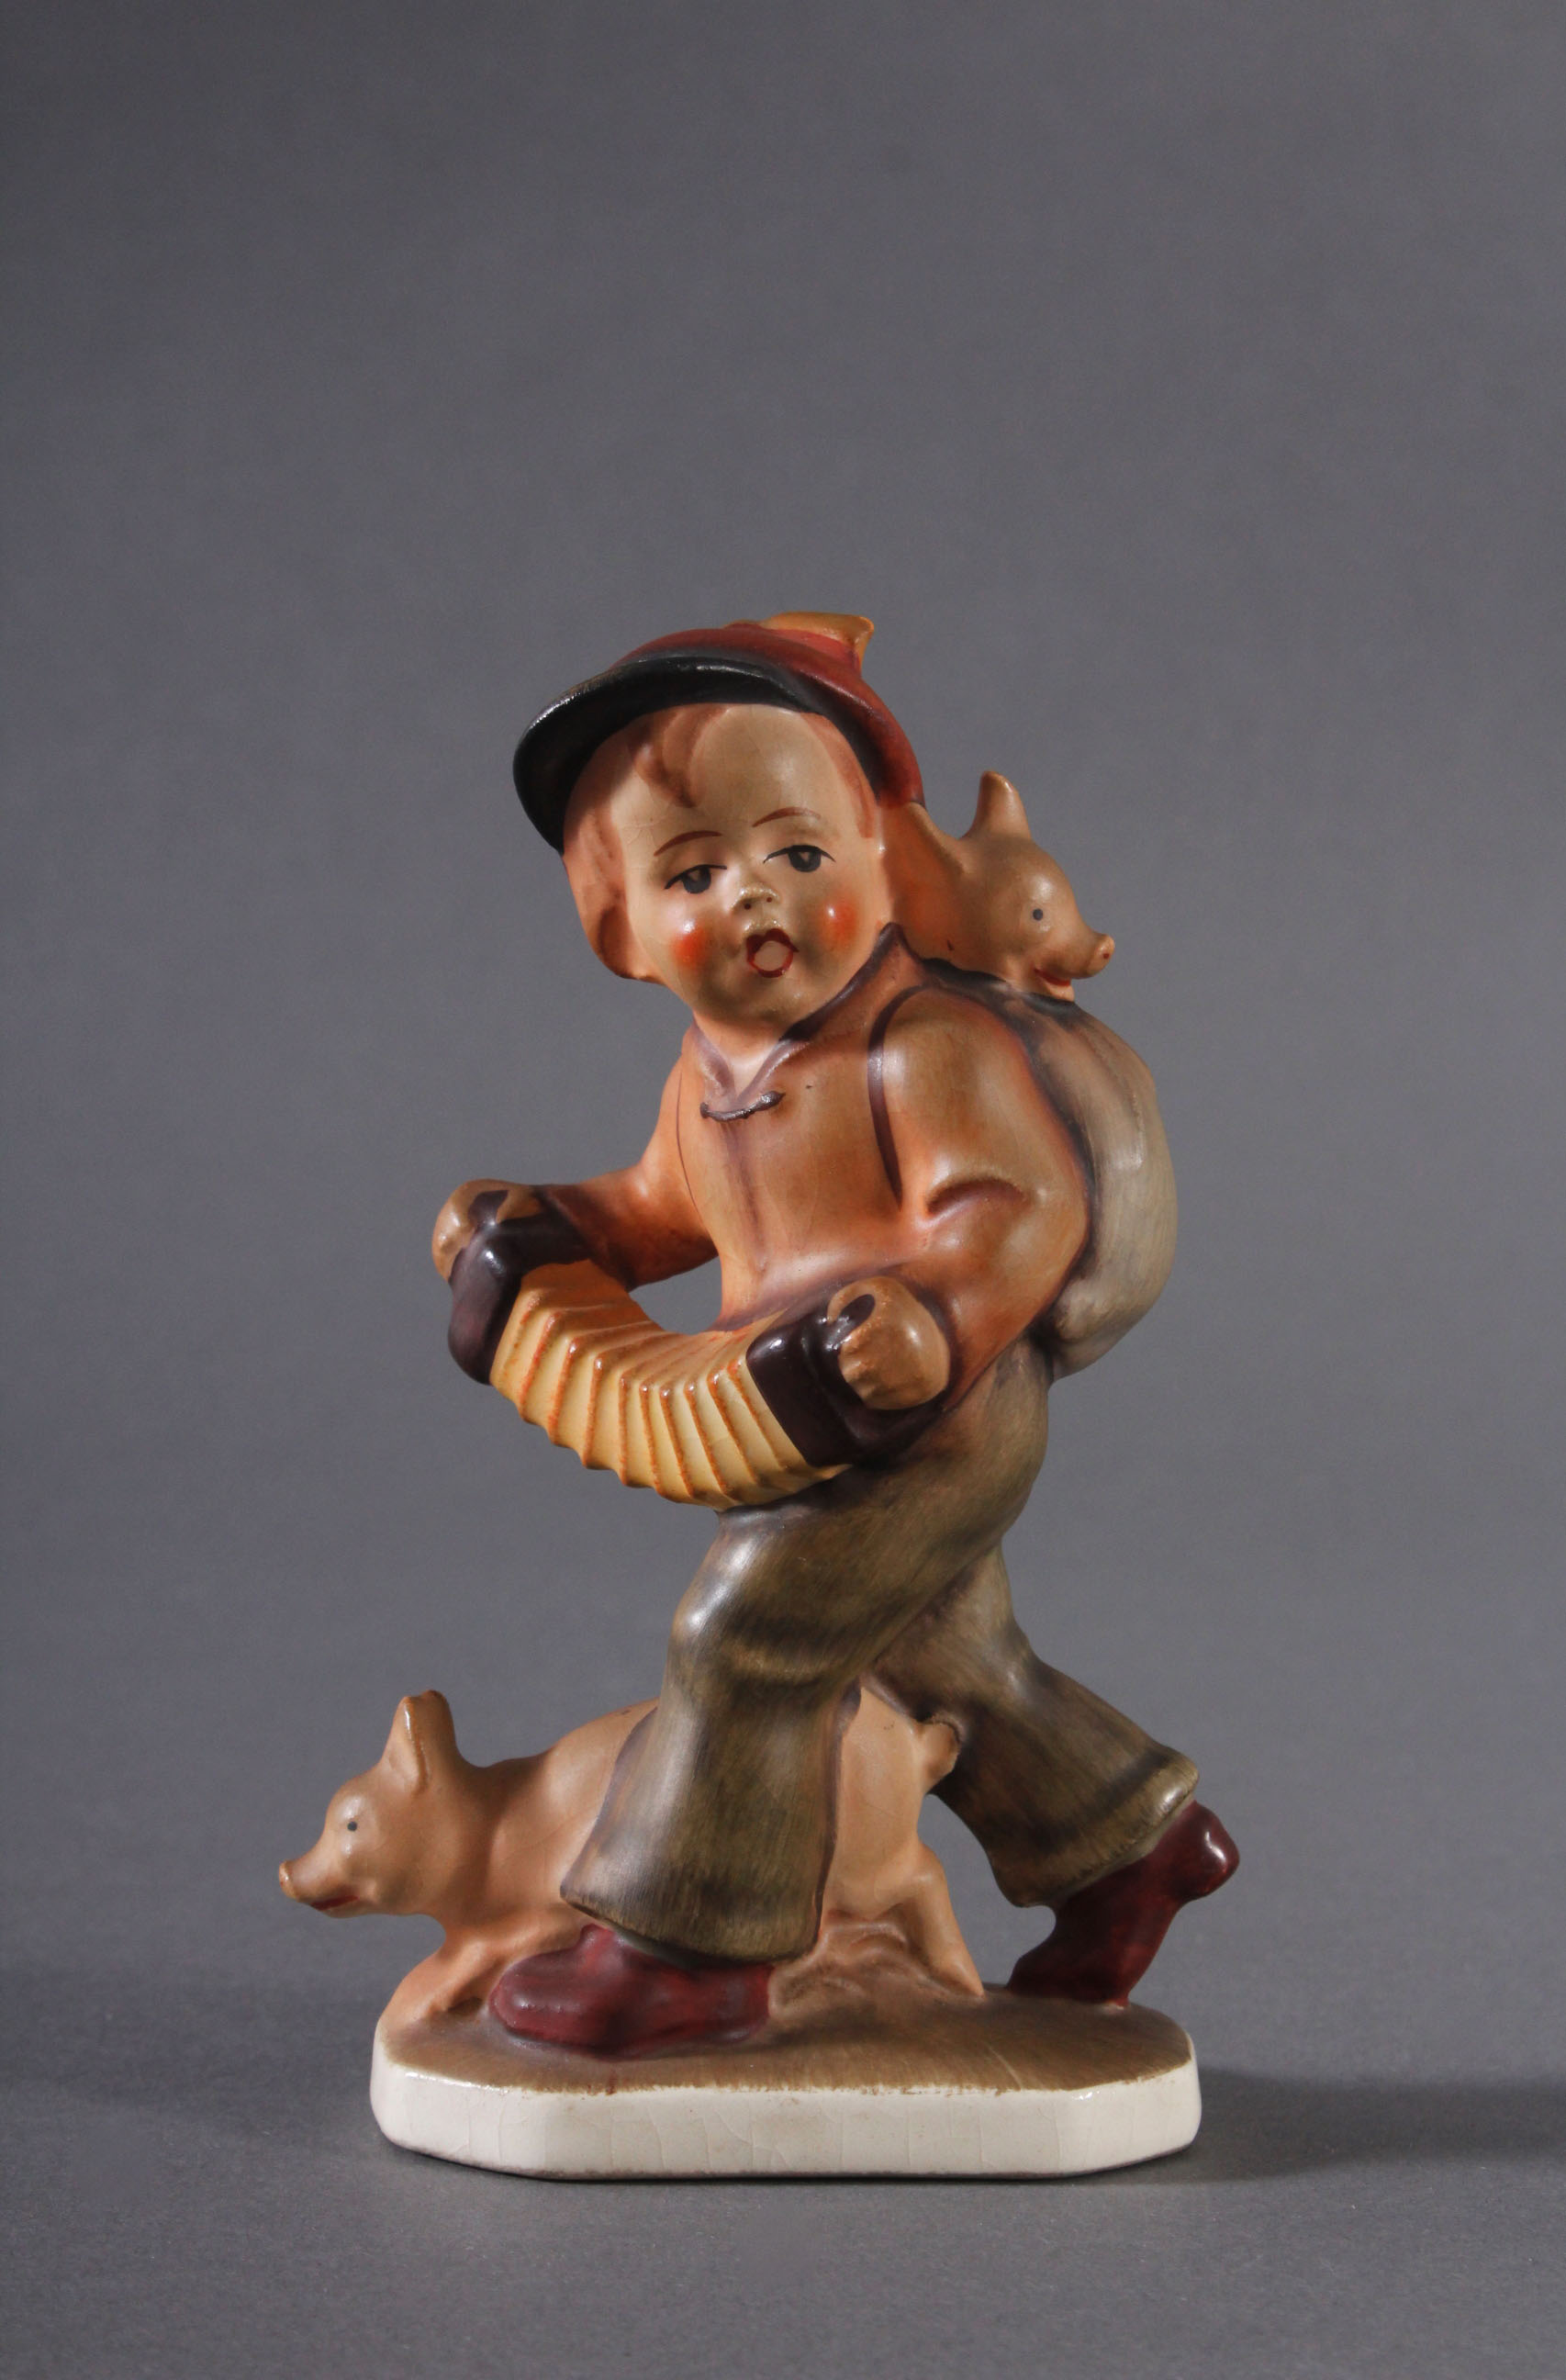 Hummelfigur 'Friedl' aus den 30er/40er Jahren